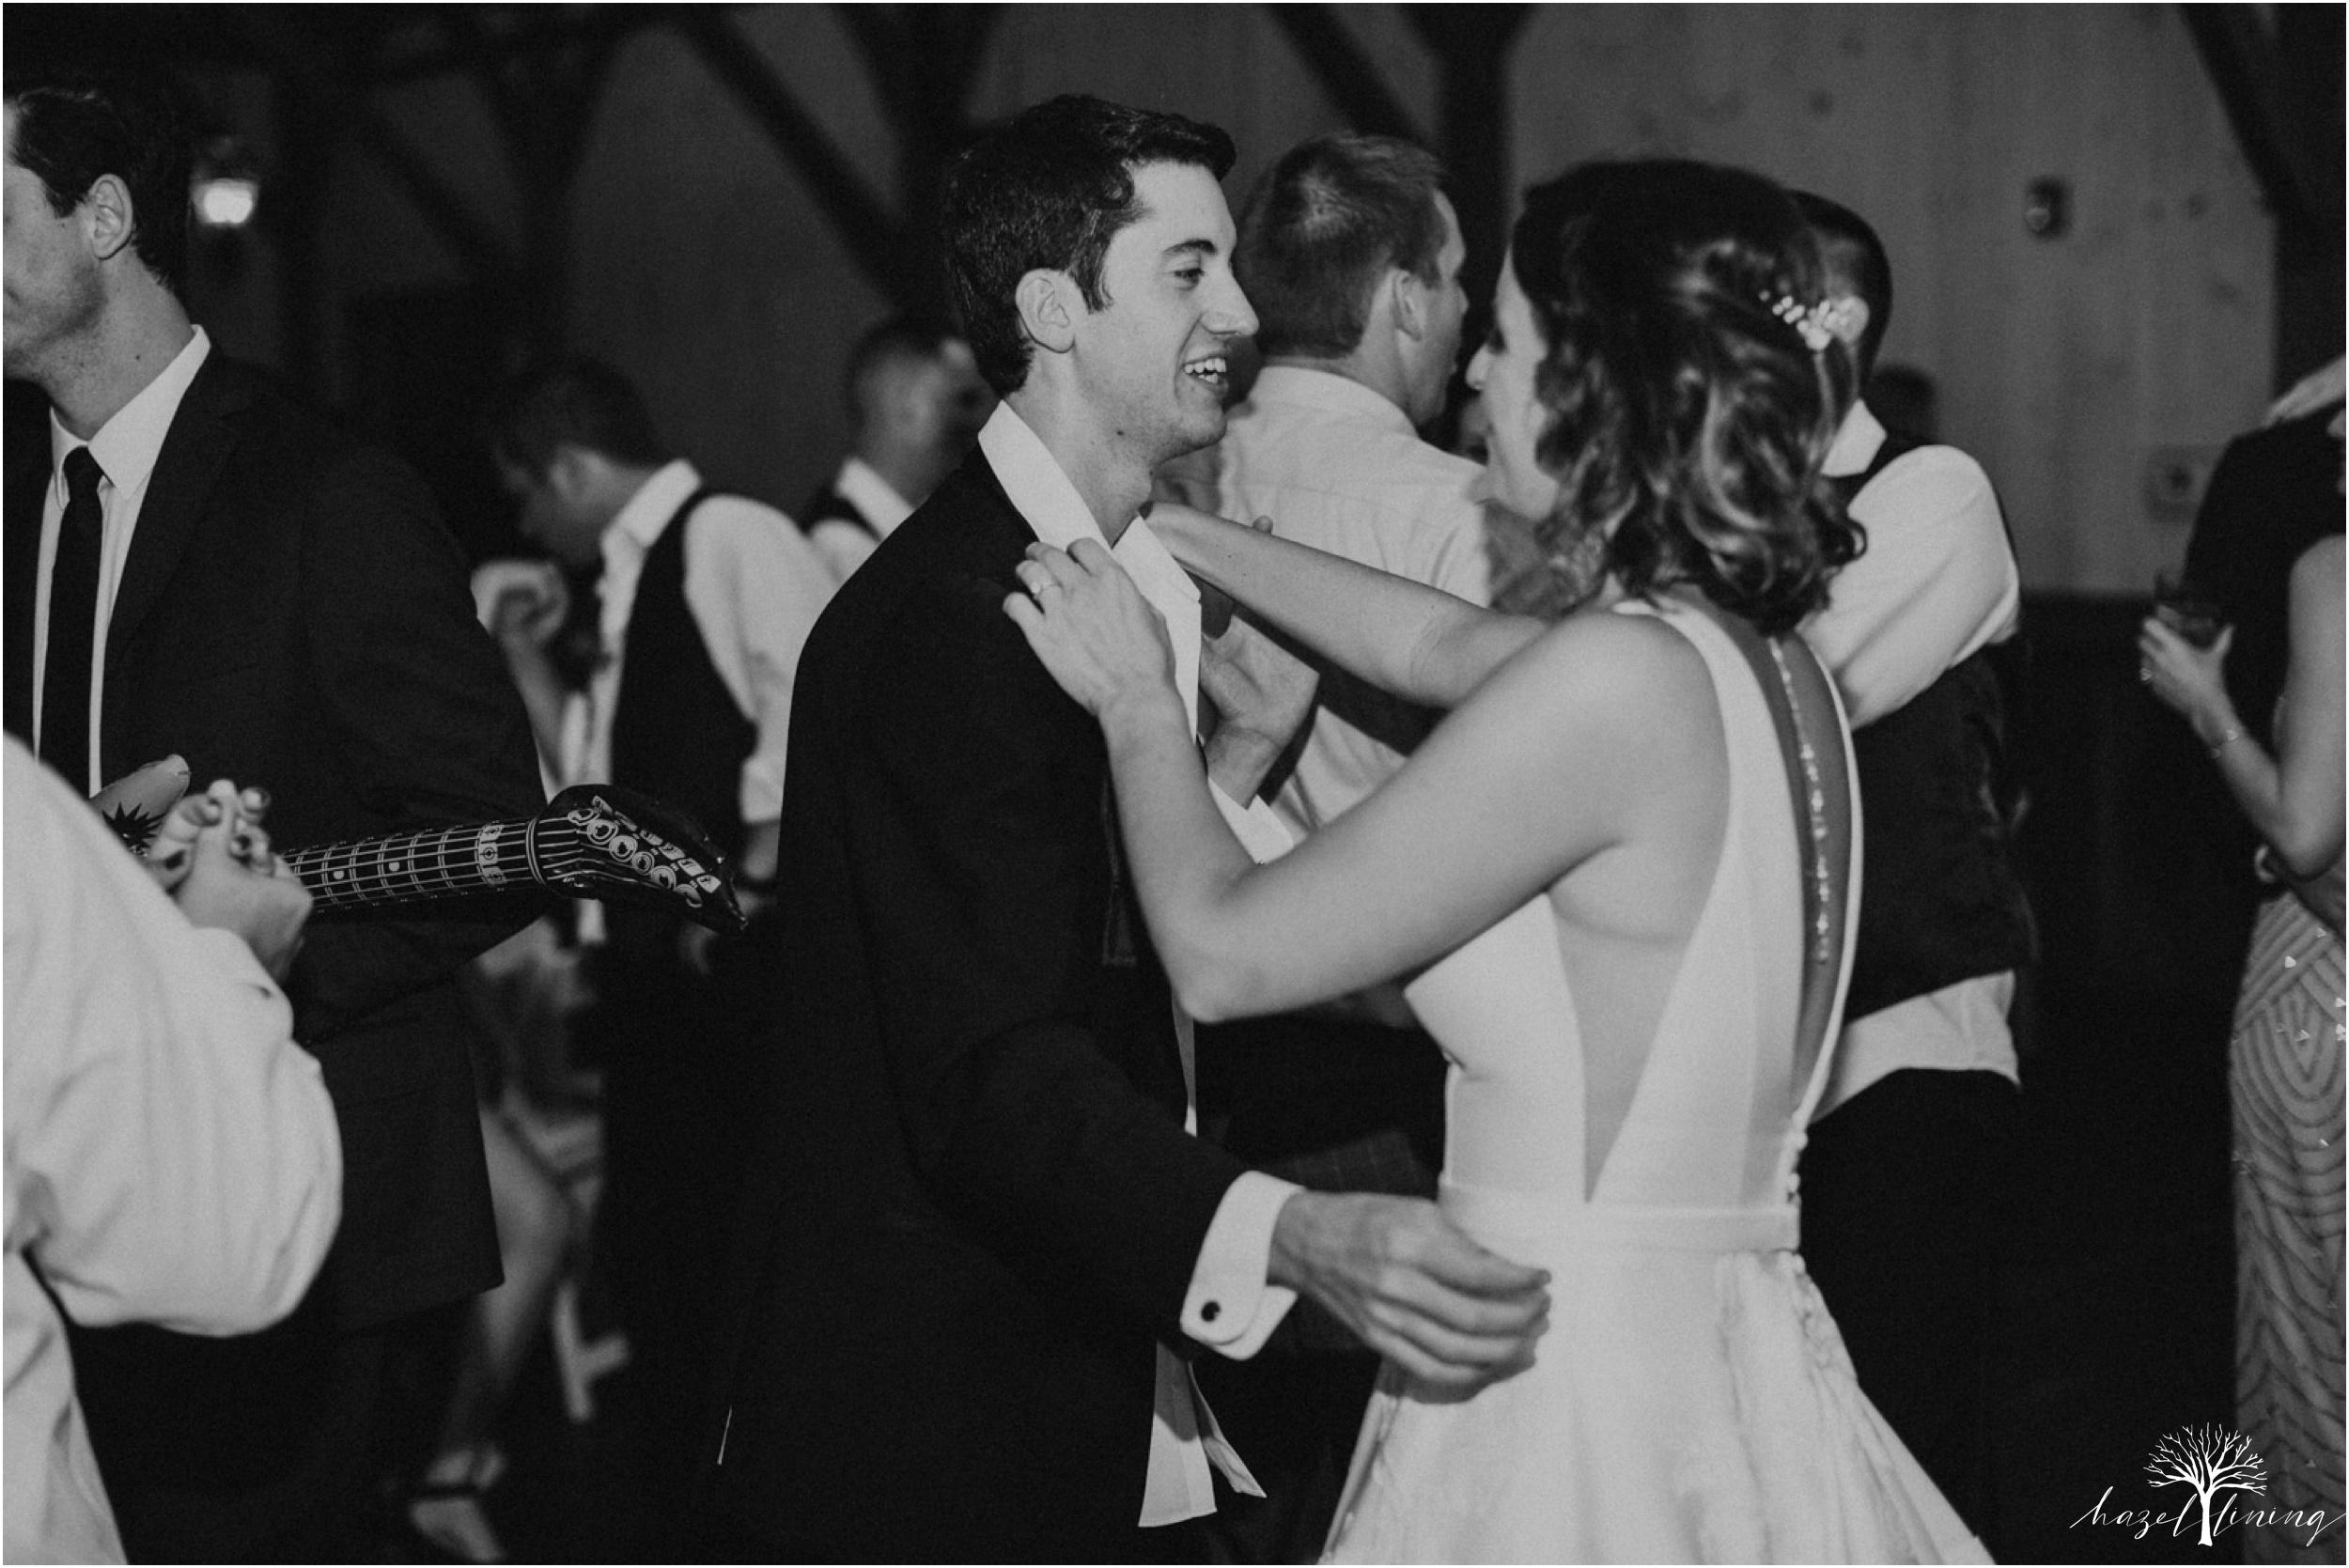 maureen-hepner-anthony-giordano-rose-bank-winery-newtow-pennsylvania-luxury-summer-wedding-hazel-lining-photography-destination-elopement-wedding-engagement-photography_0155.jpg